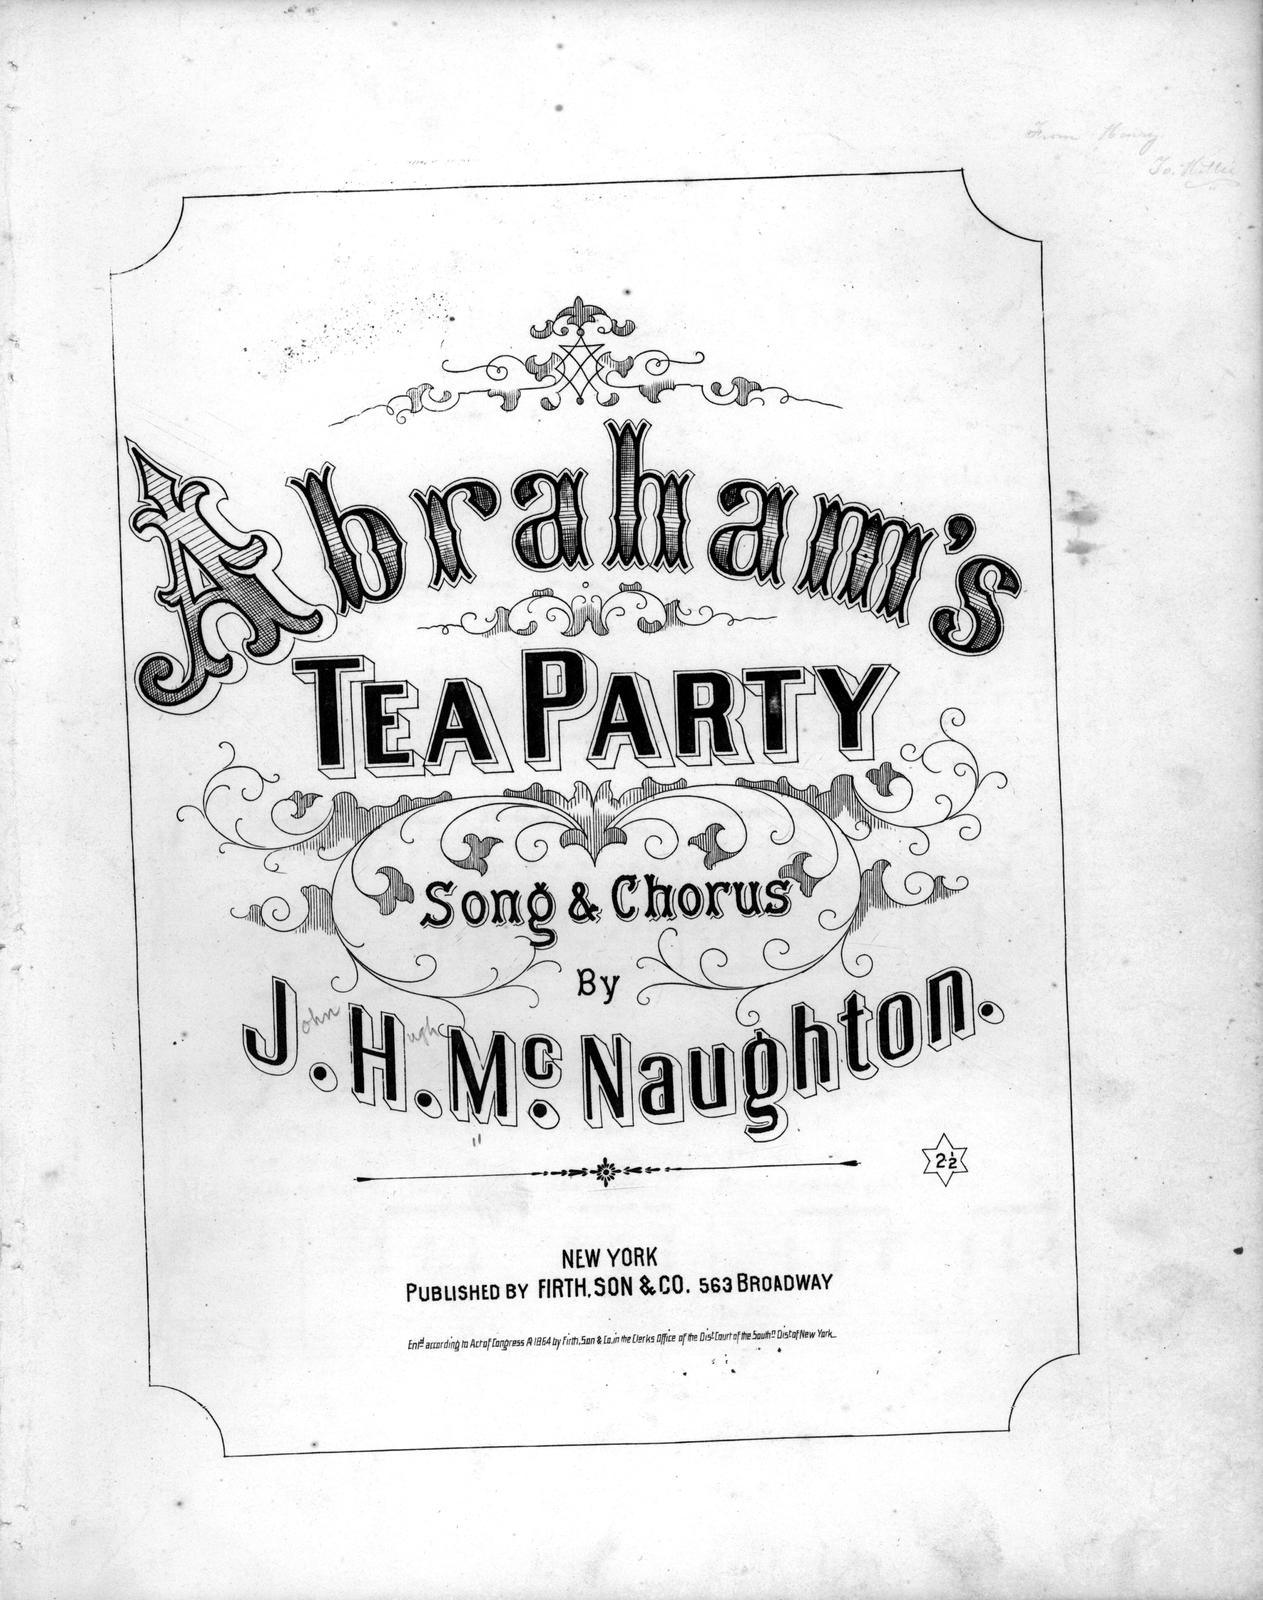 Abraham's tea party: song & chorus by J.H. McNaughton.